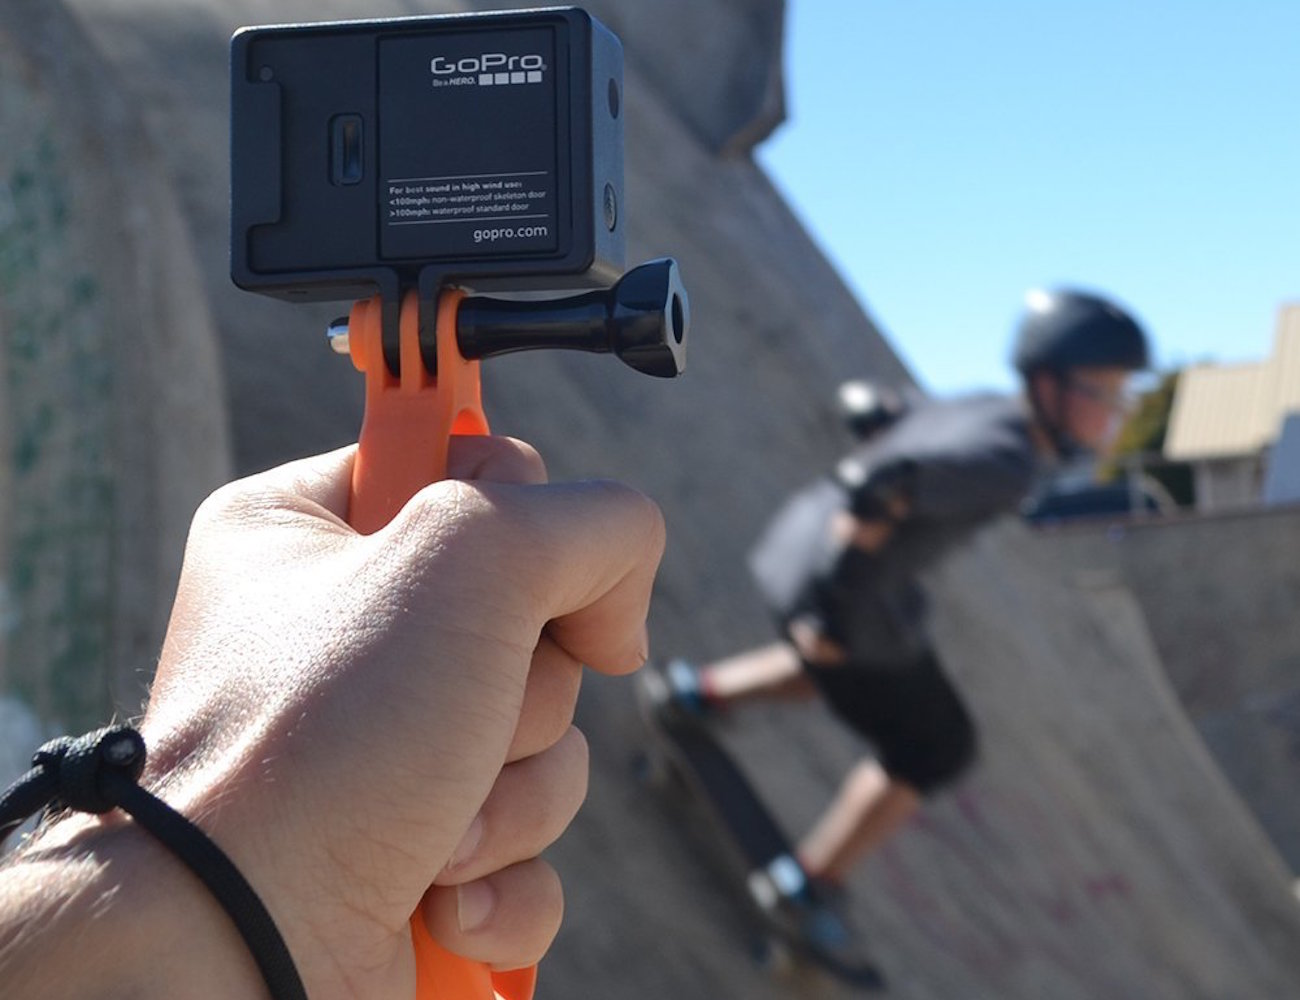 GoKnuckles+%26%238211%3B+Handheld+Mount+For+Your+GoPro+HERO+Camera